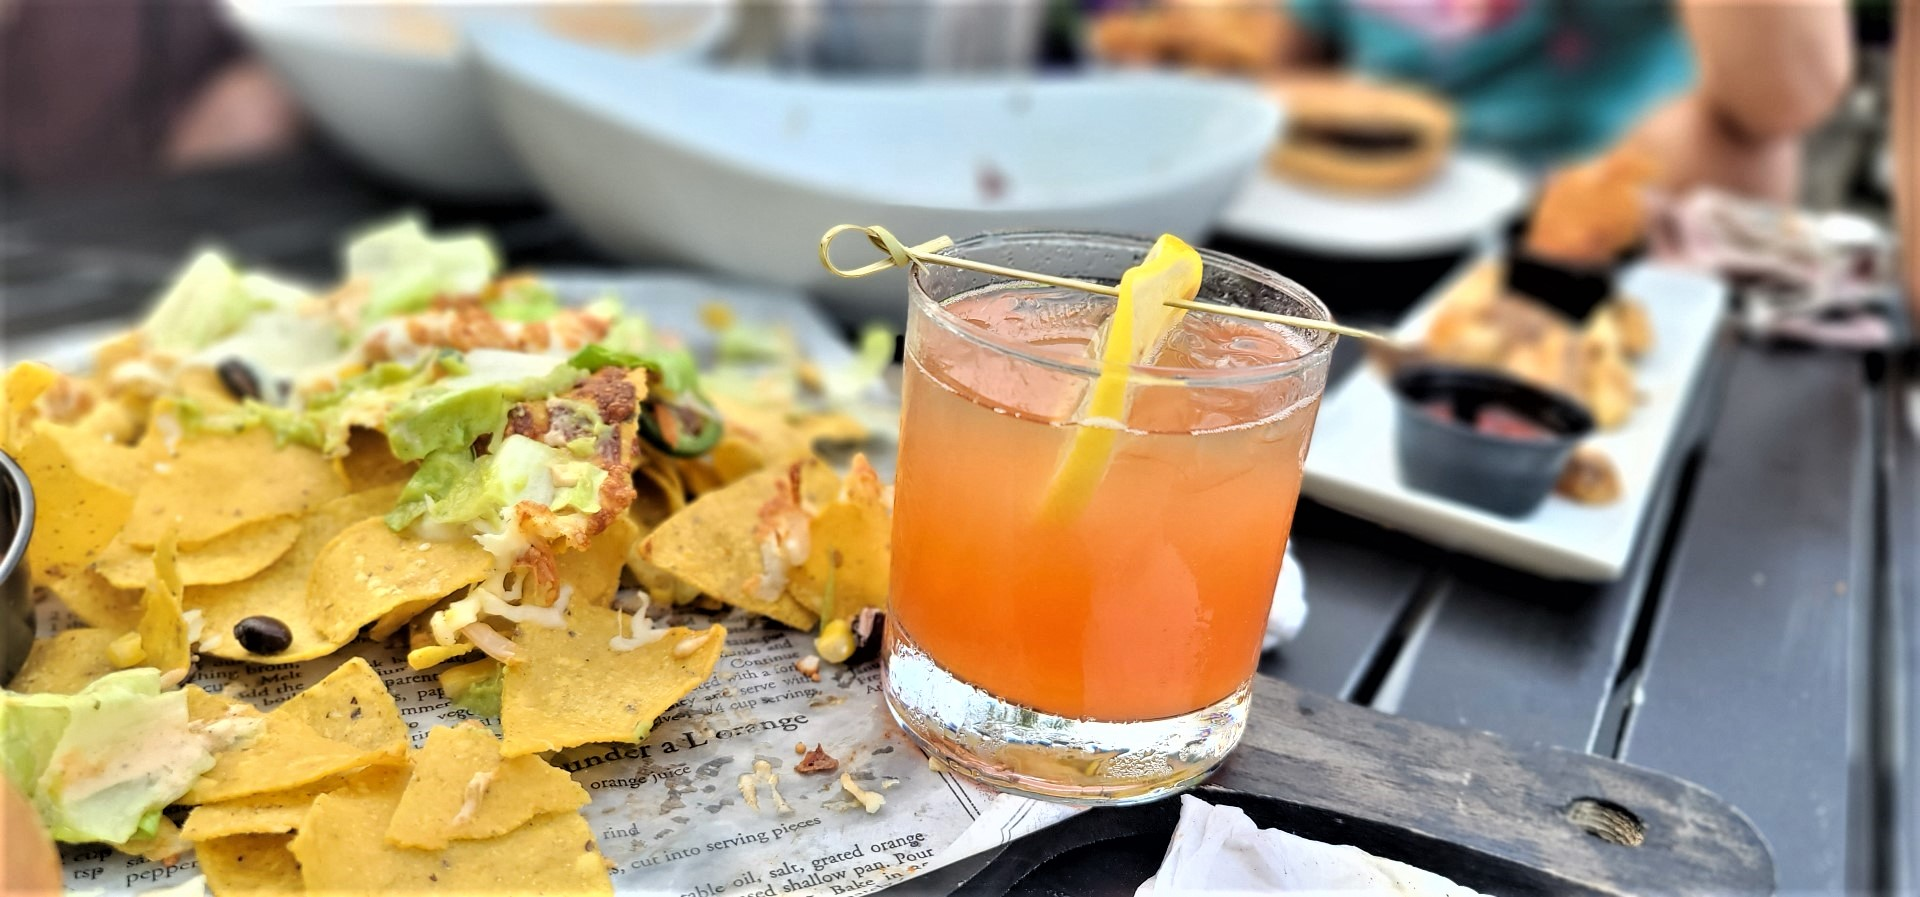 cocktails and nachos